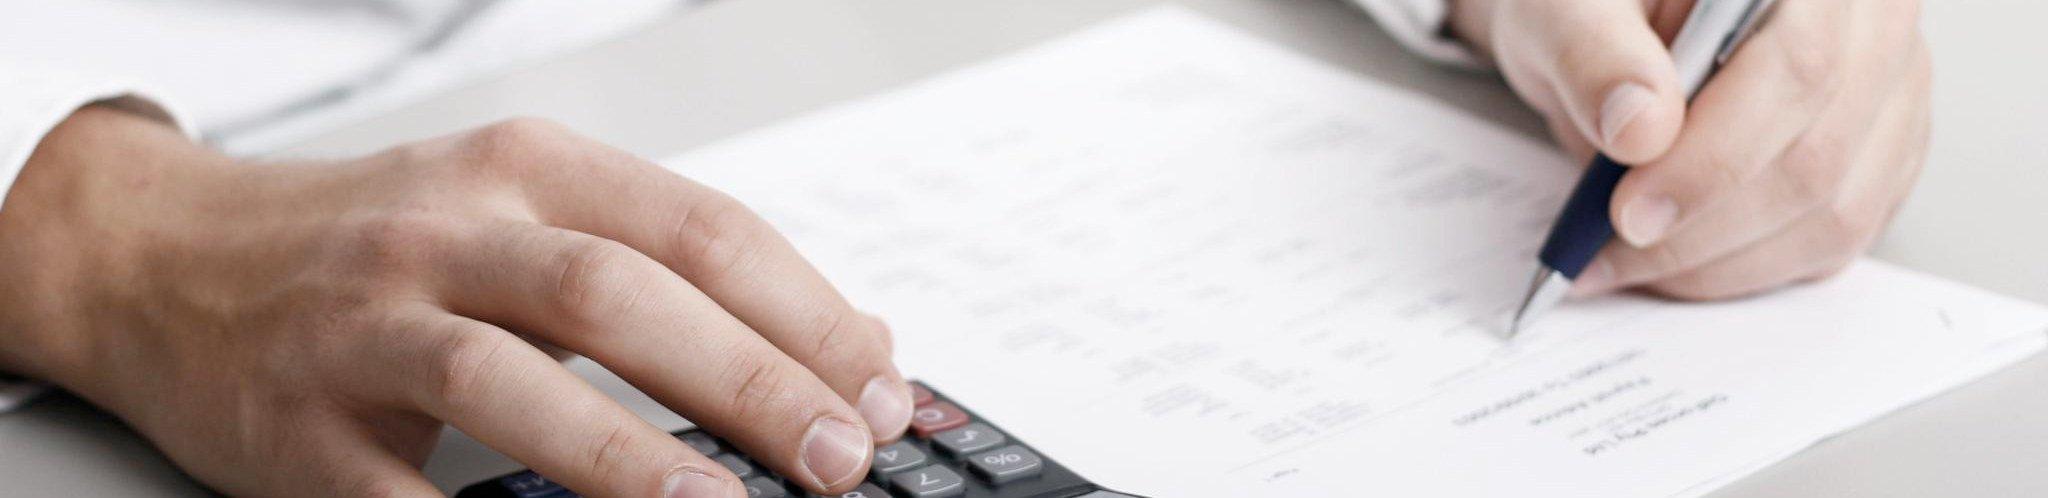 Letselschade berekenen | Letselschadeberekening